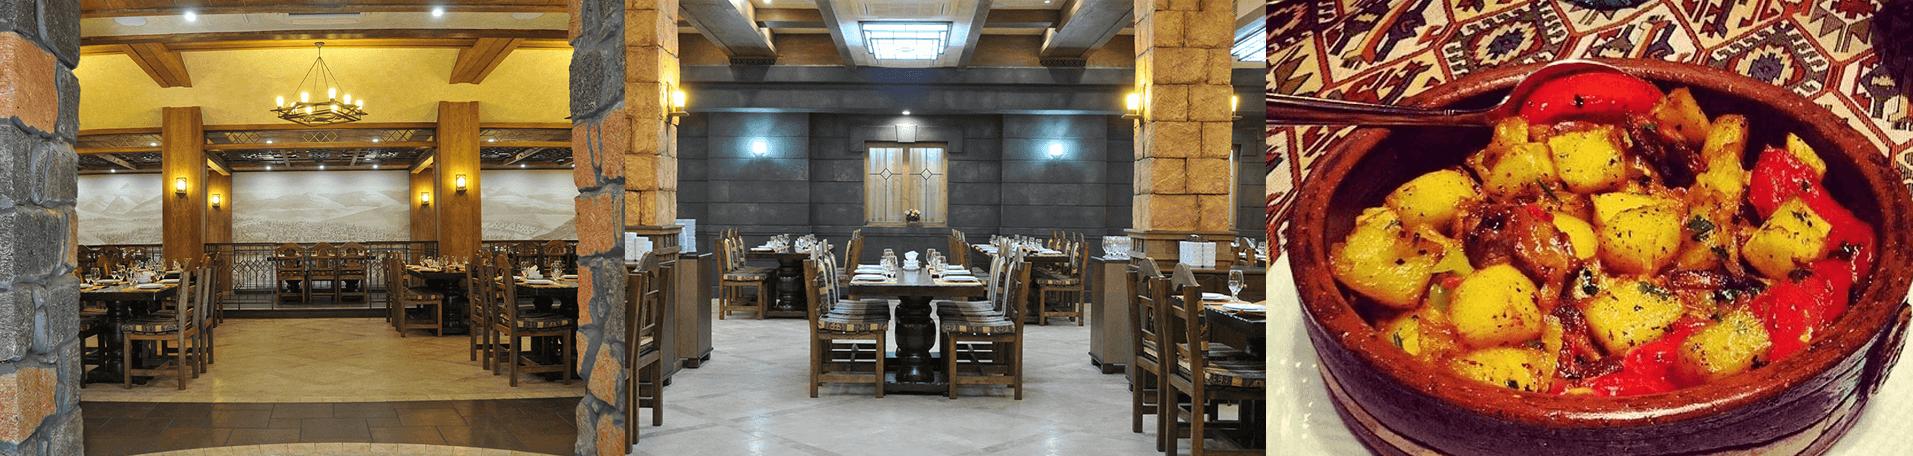 Tavern Yerevan (Teryan)